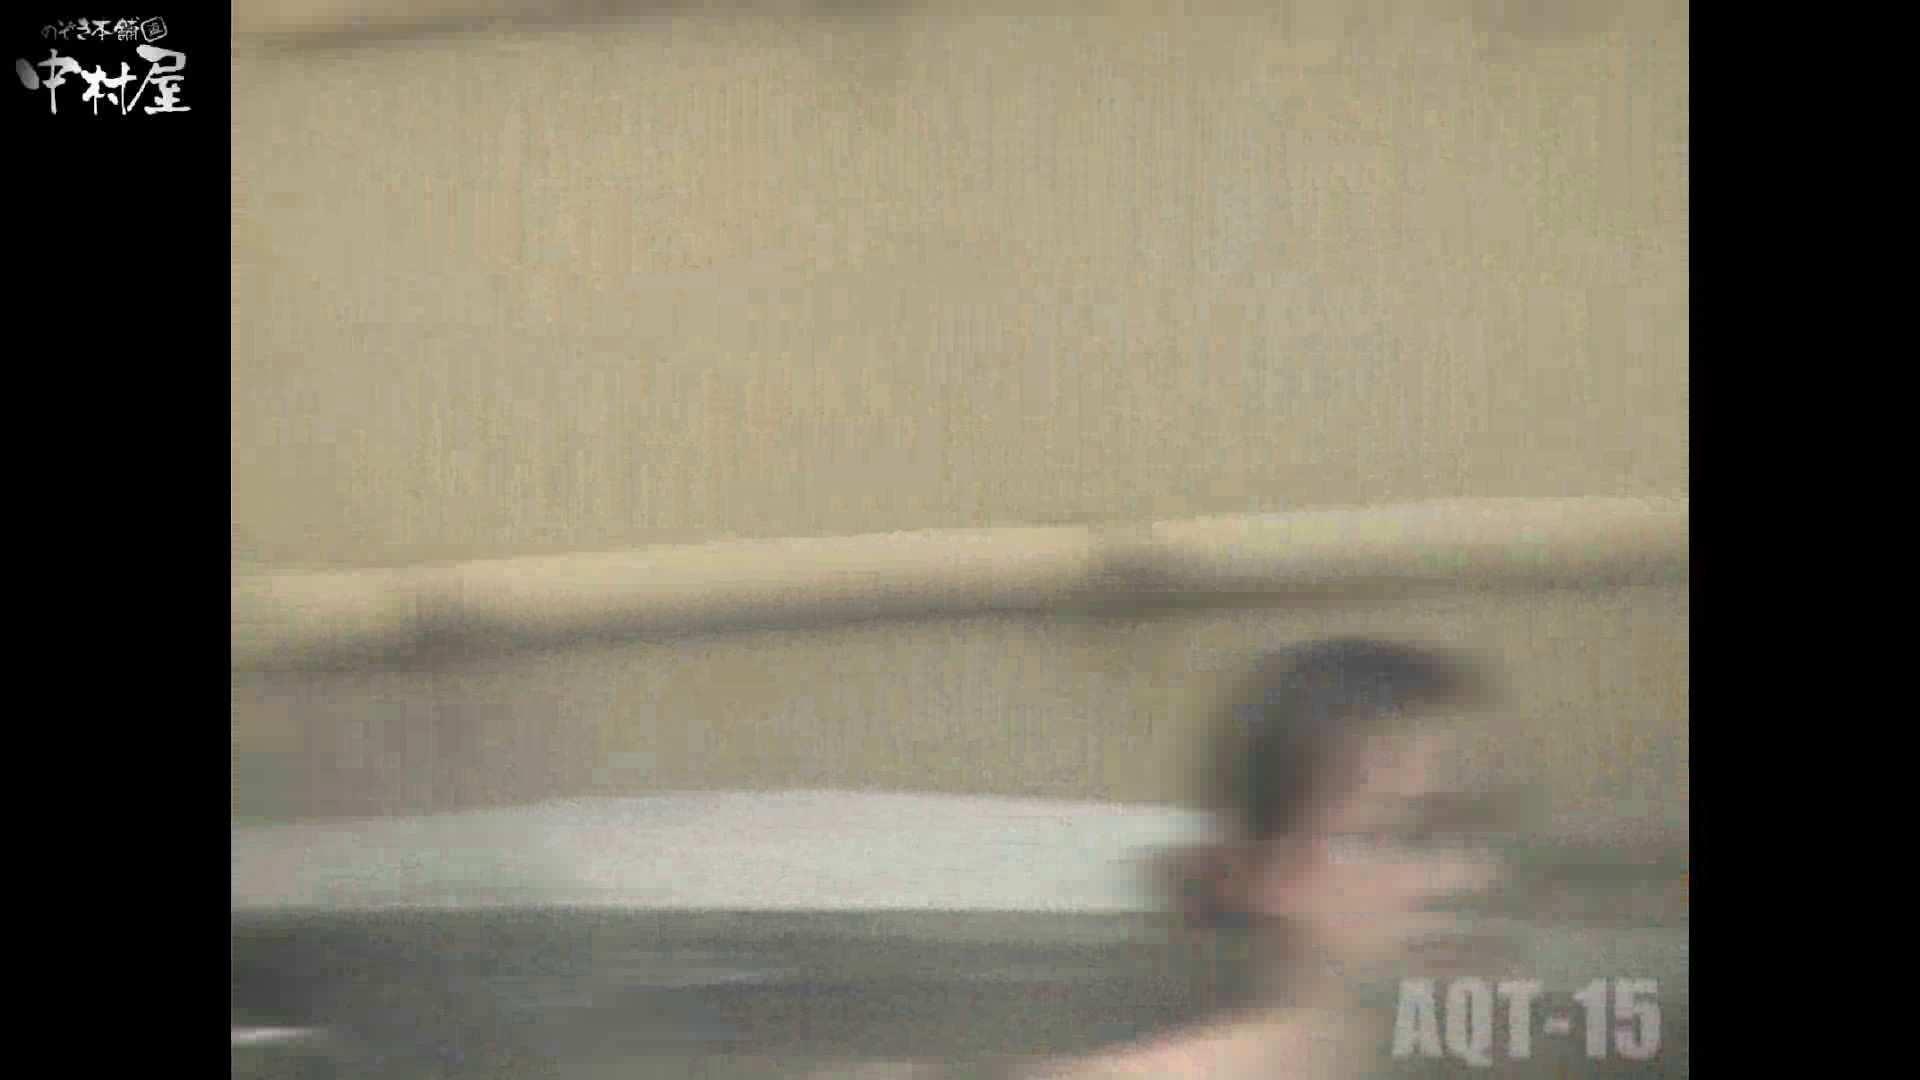 Aquaな露天風呂Vol.878潜入盗撮露天風呂十五判湯 其の八 盗撮師作品 ぱこり動画紹介 95pic 86